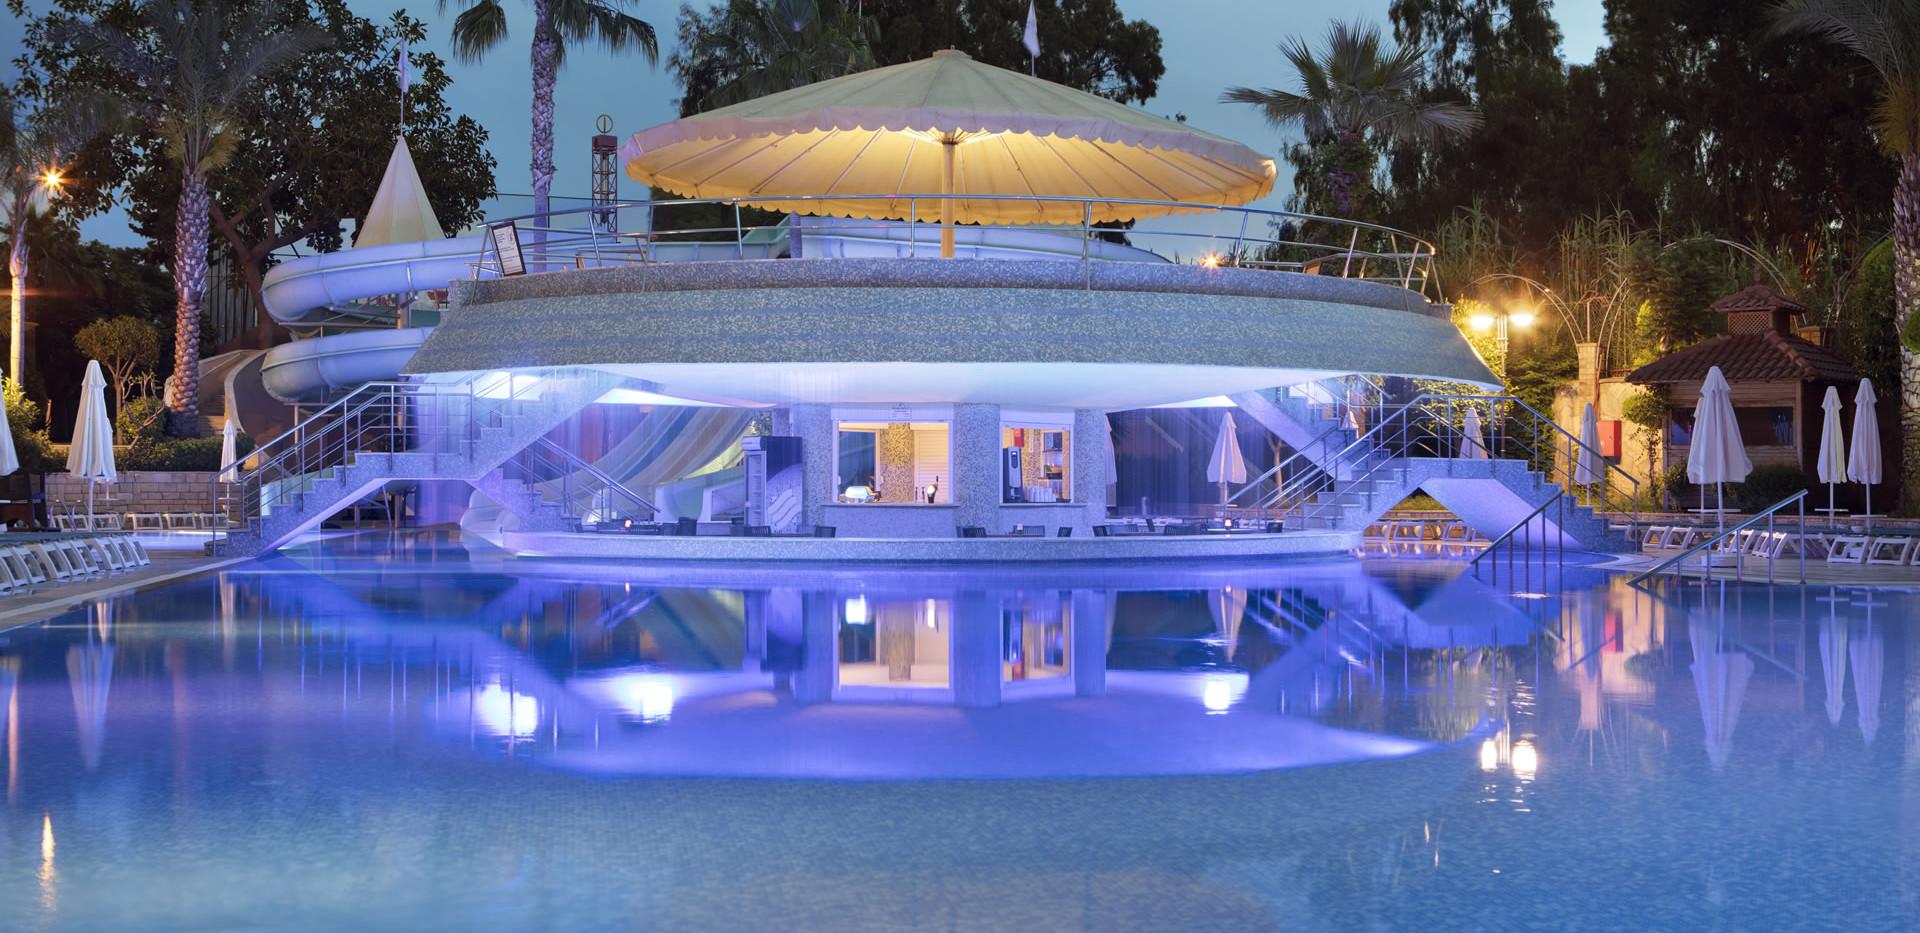 saphir-hotel-villas-otelimiz-205.jpg